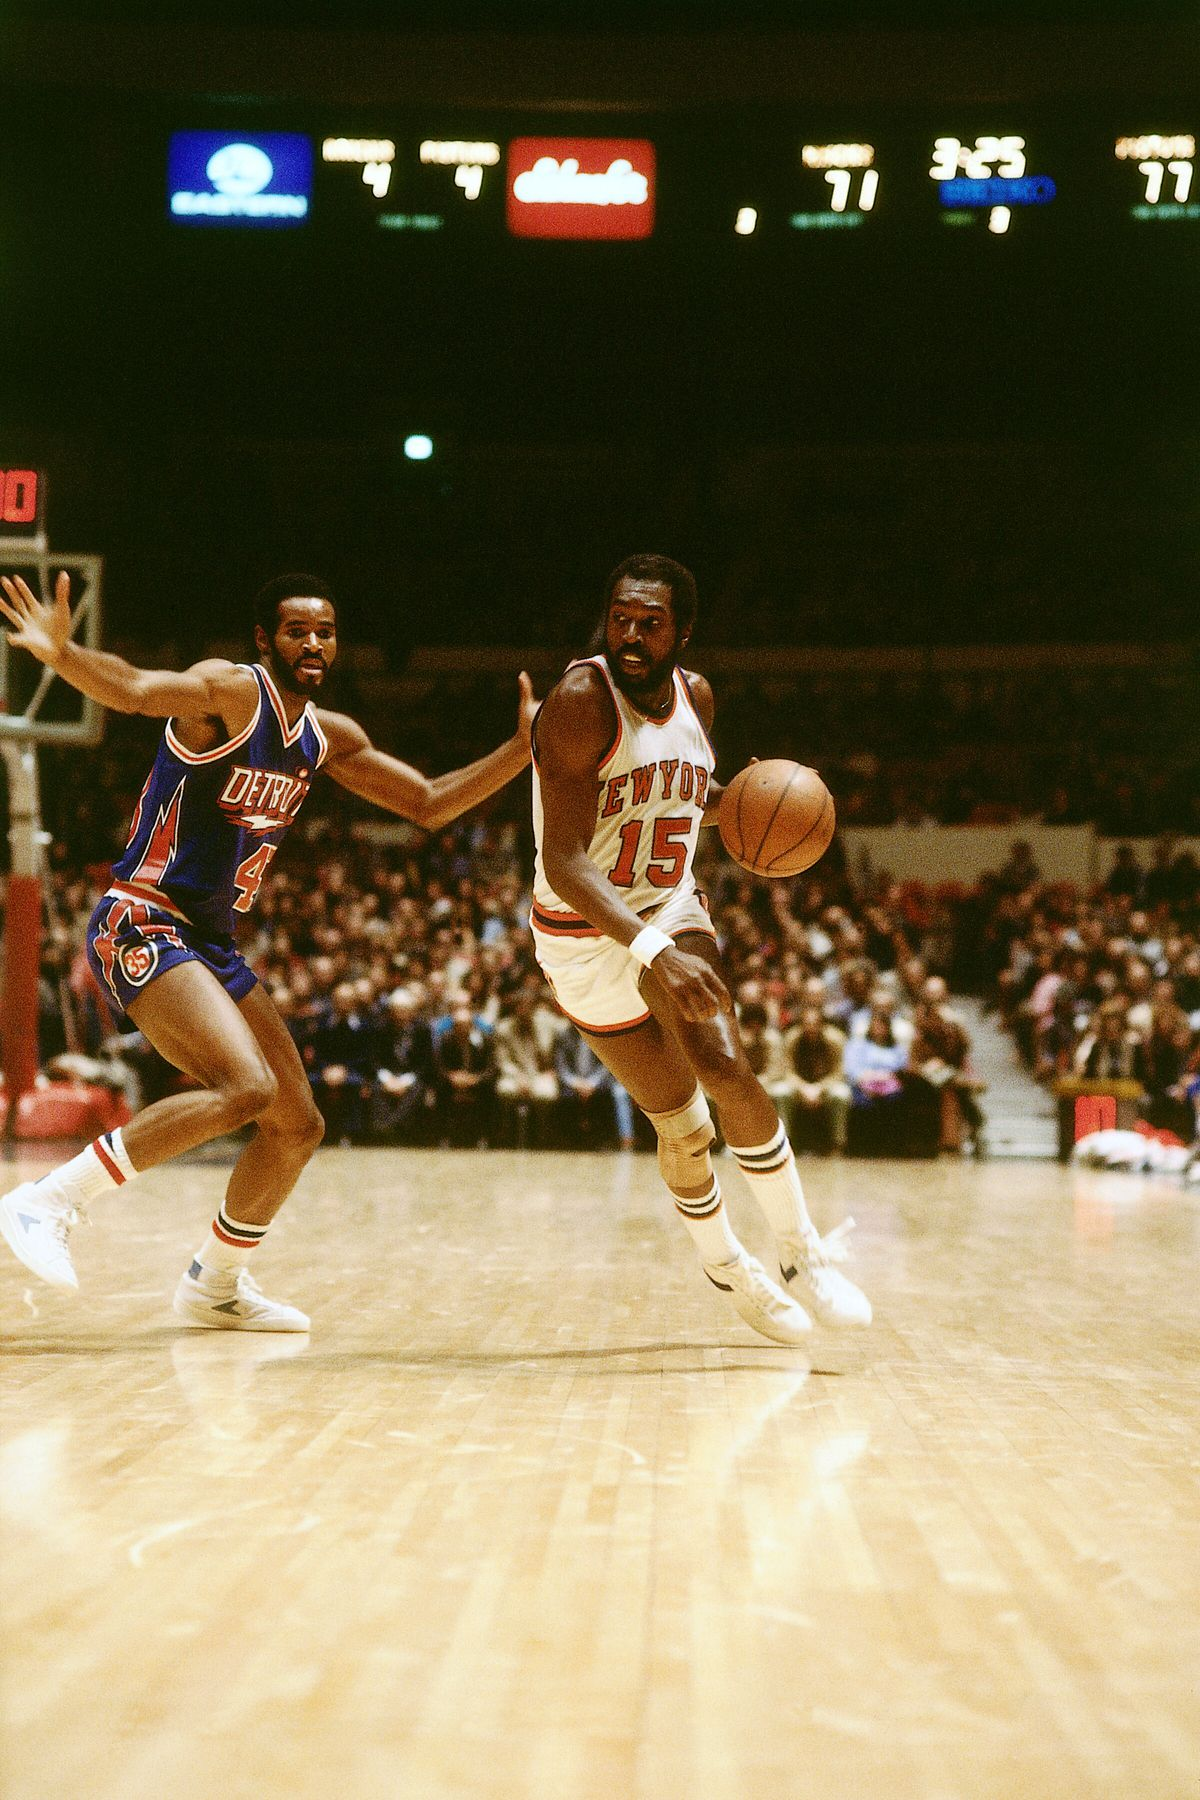 Detoit Pistons v New York Knicks